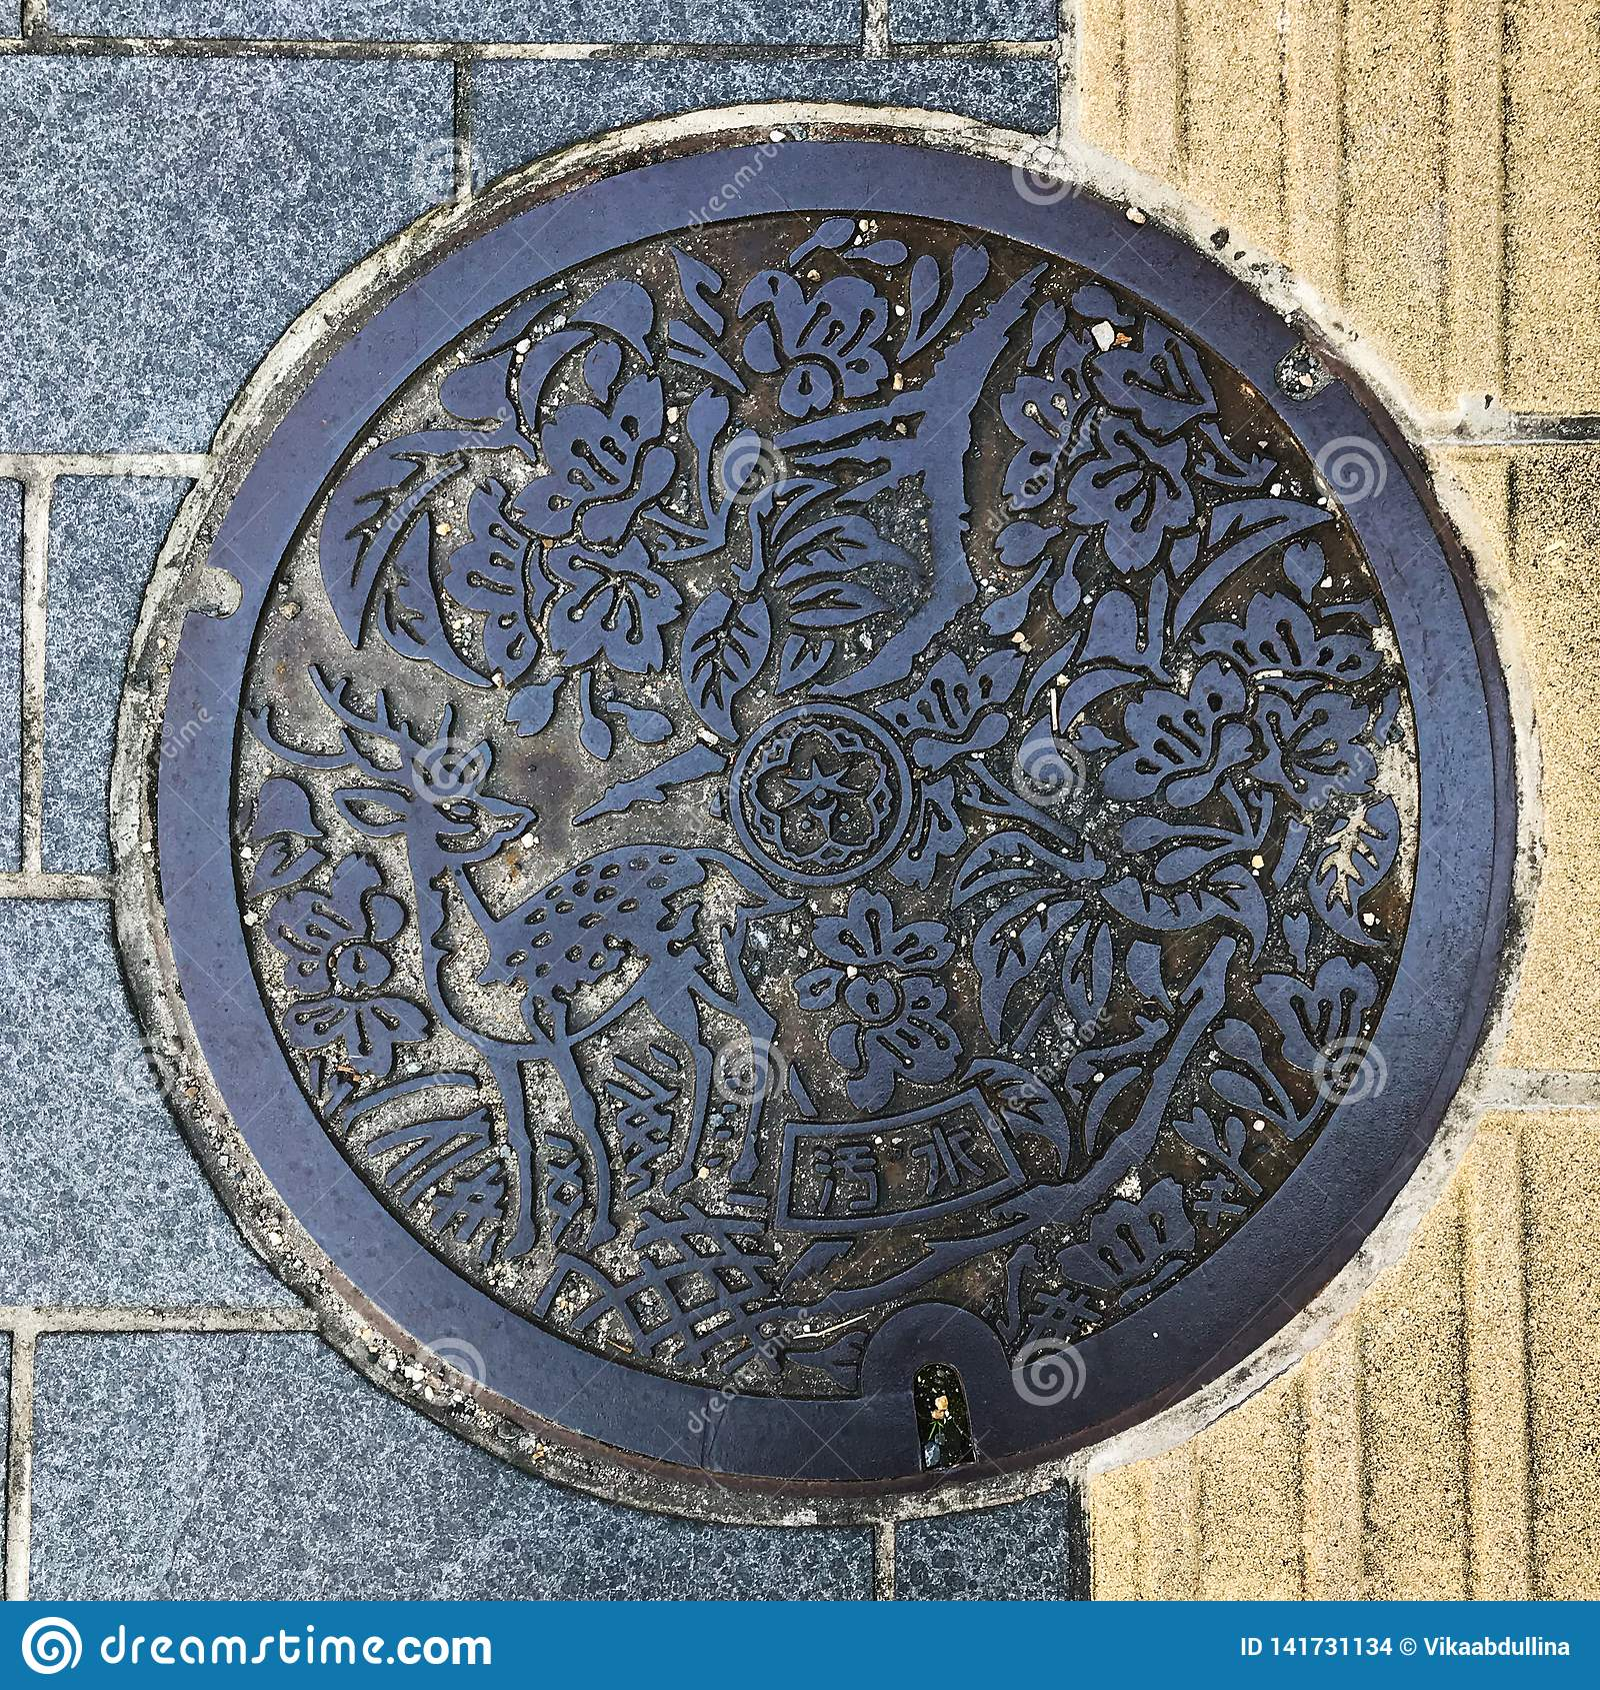 Nara, Japan 11 Oktober, 2018: riool GLB/mangatdekking/broedsel, Japanse taalmiddelen Nara